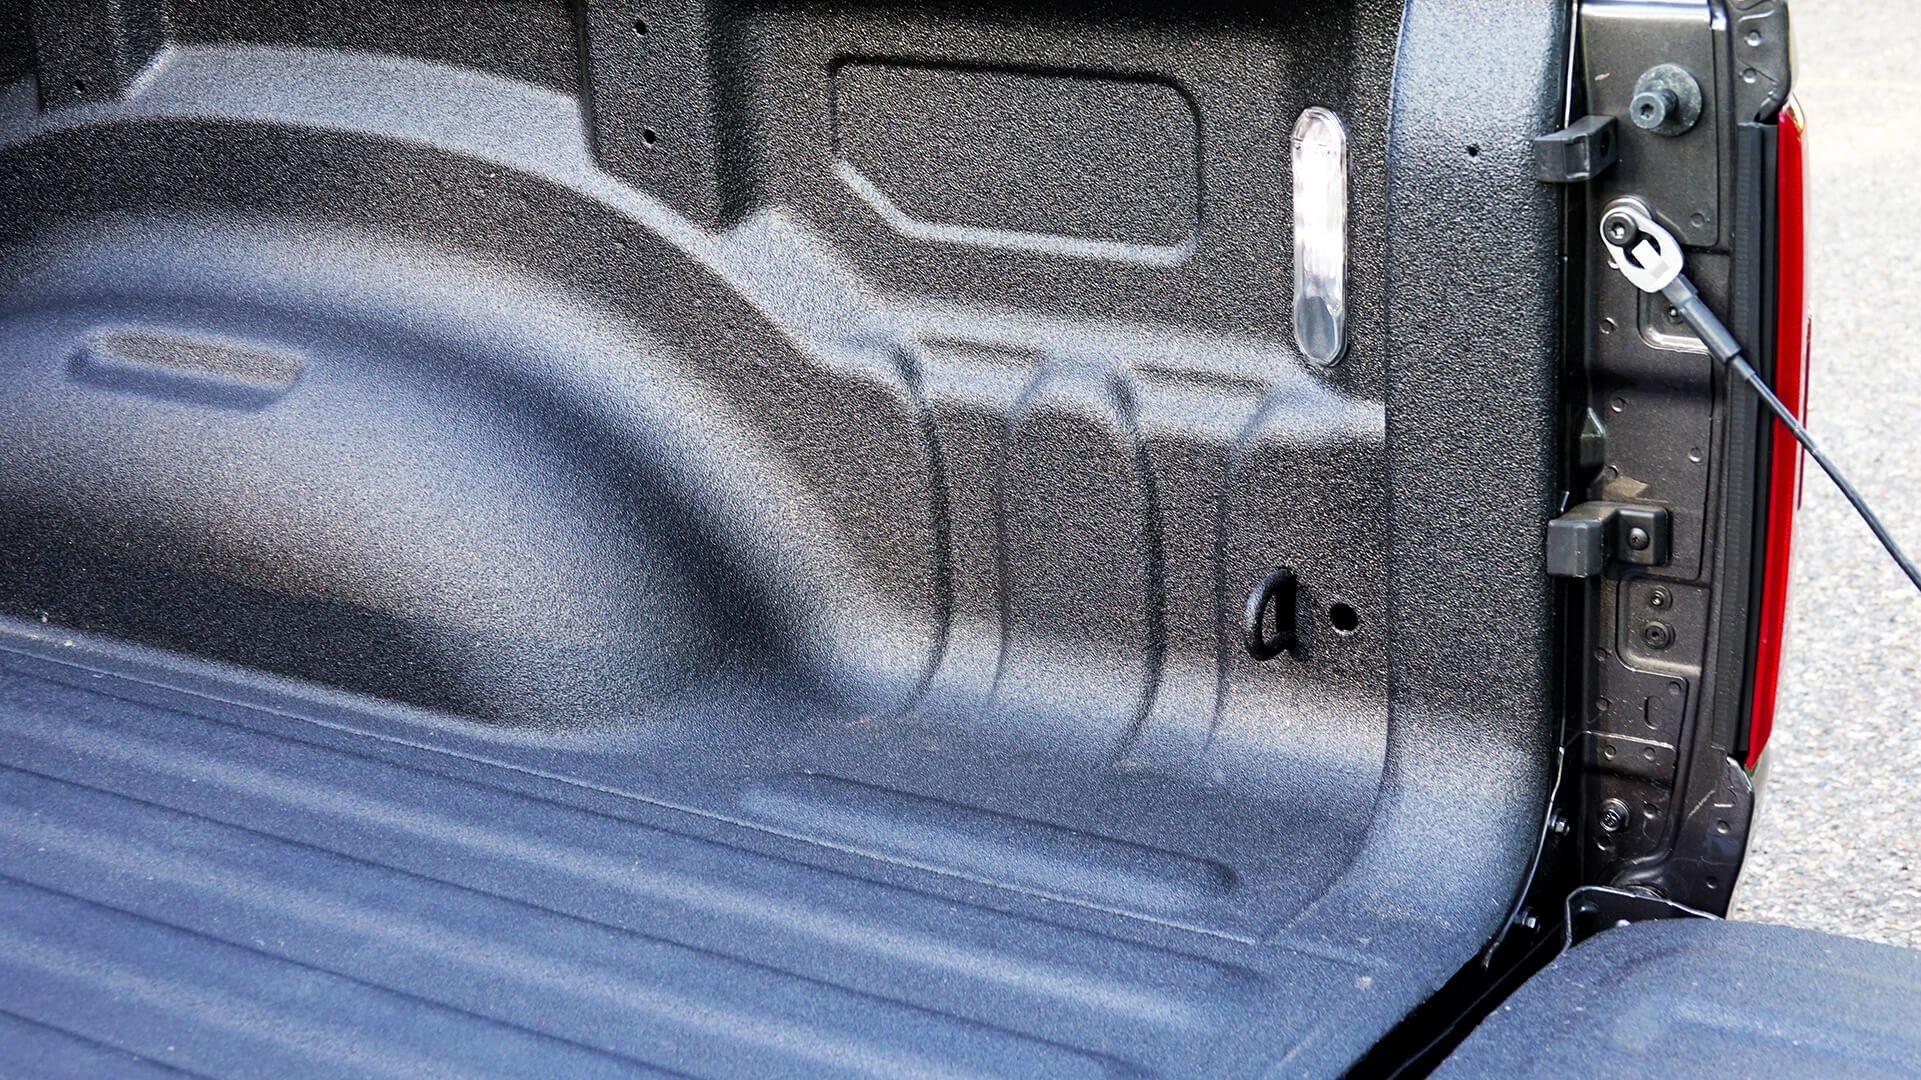 Spray-in bedliner on a RAM truck